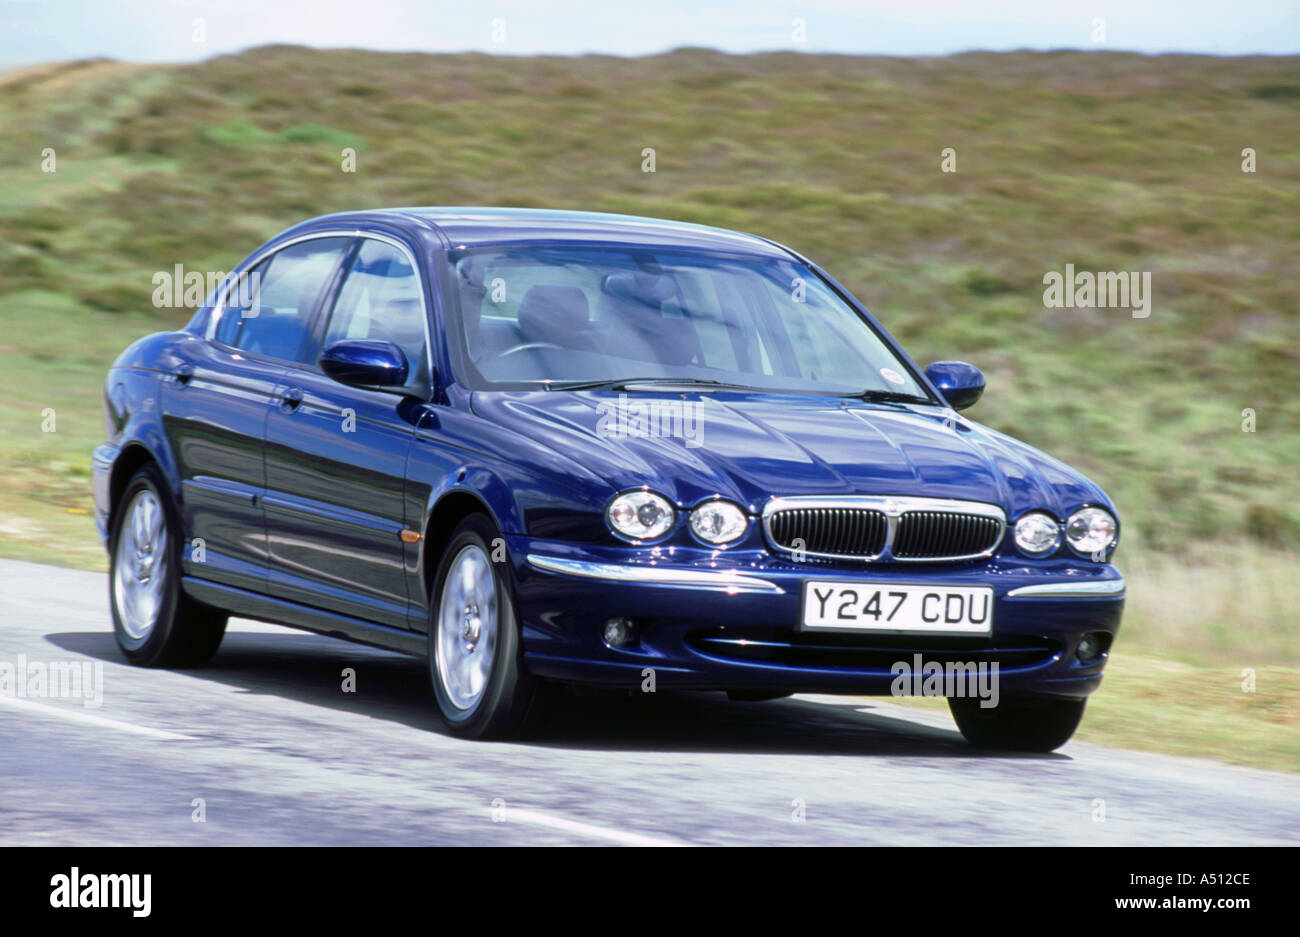 2001 Jaguar X Type 2.5 Foto de stock